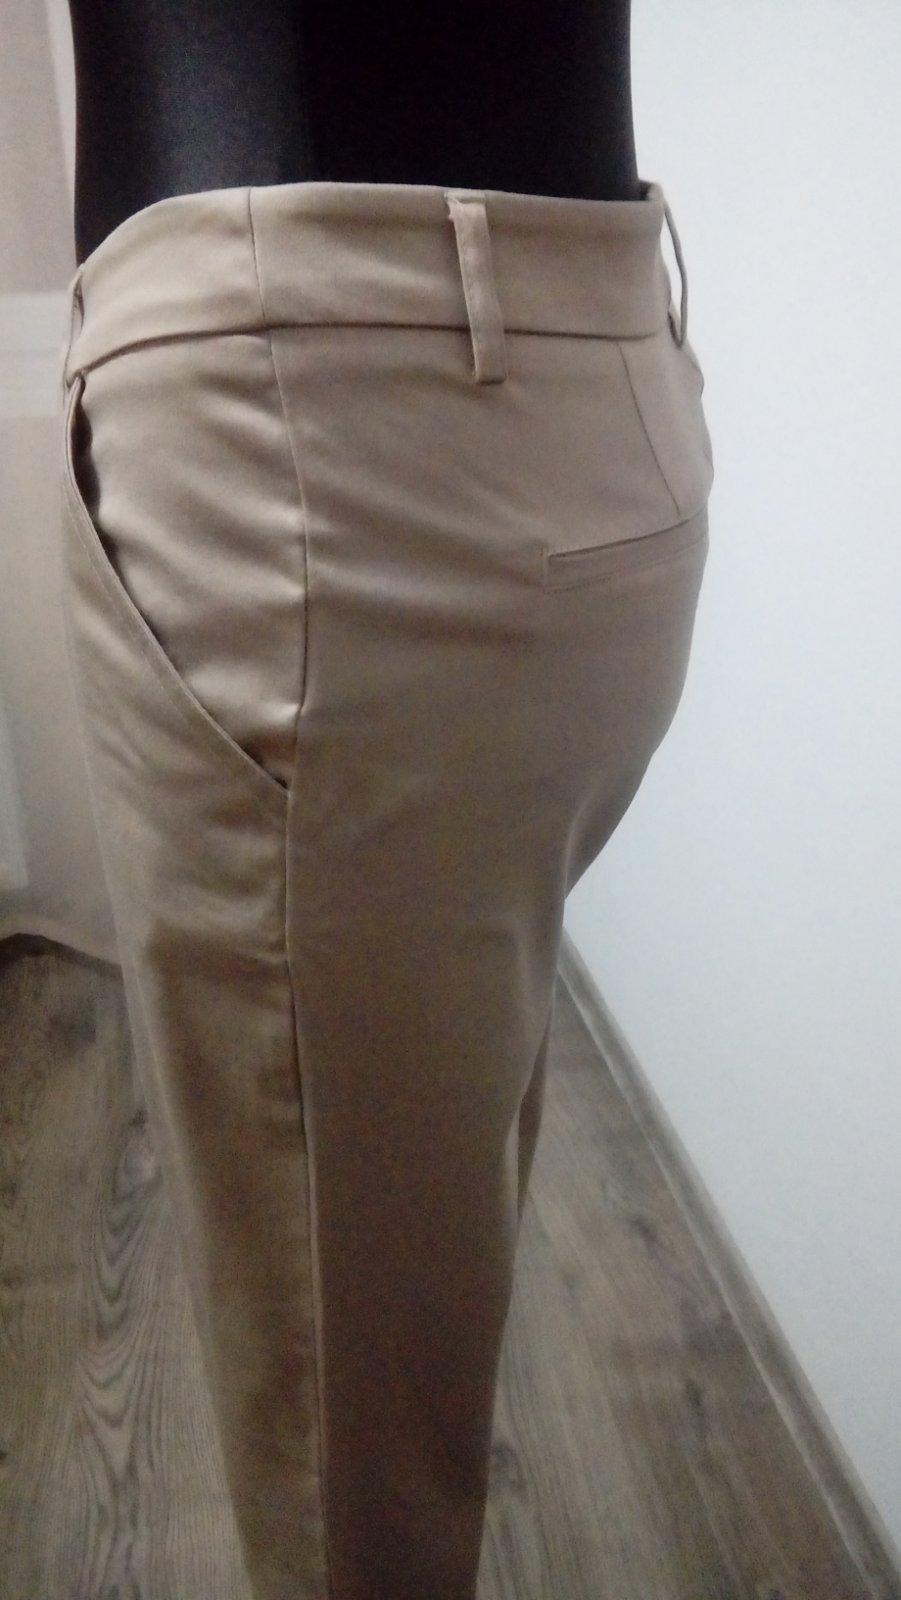 Elegantné nohavice s/m - Obrázok č. 3